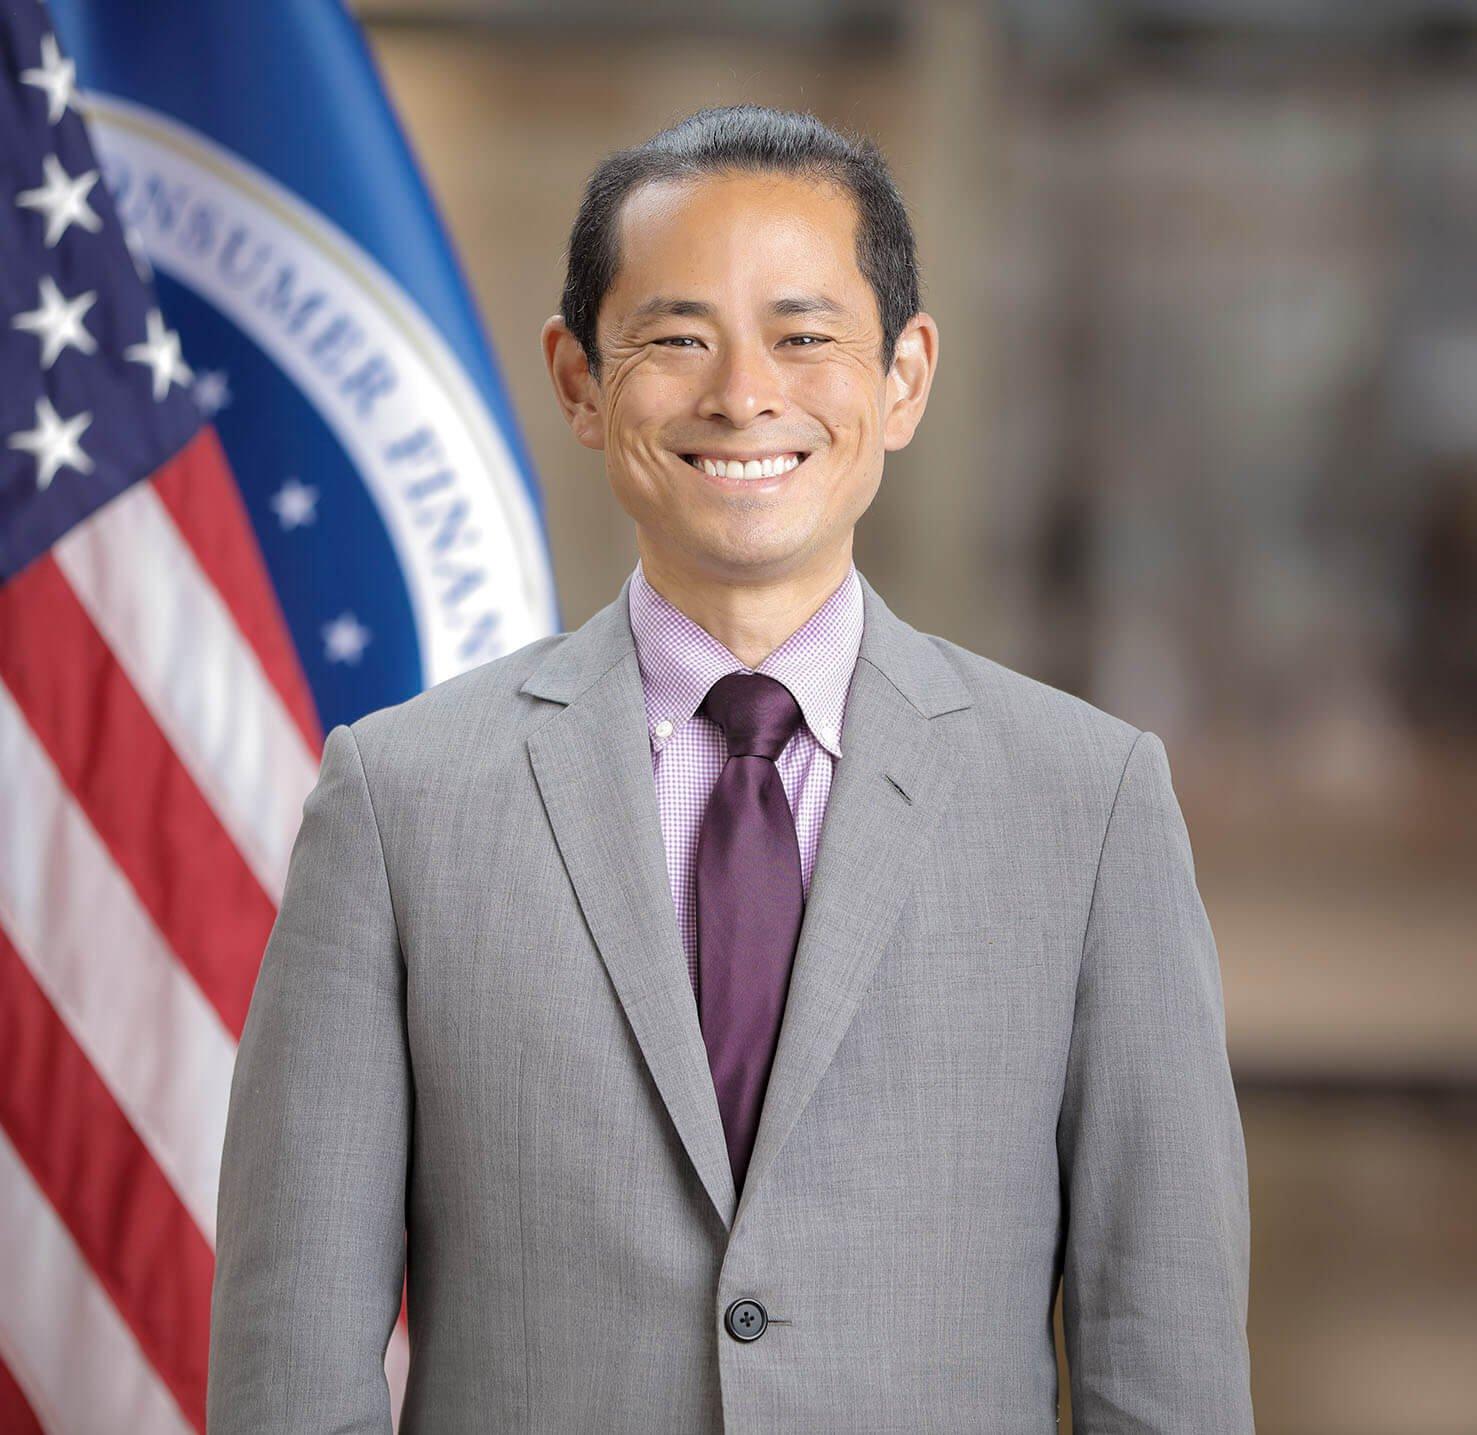 Dave Uejio